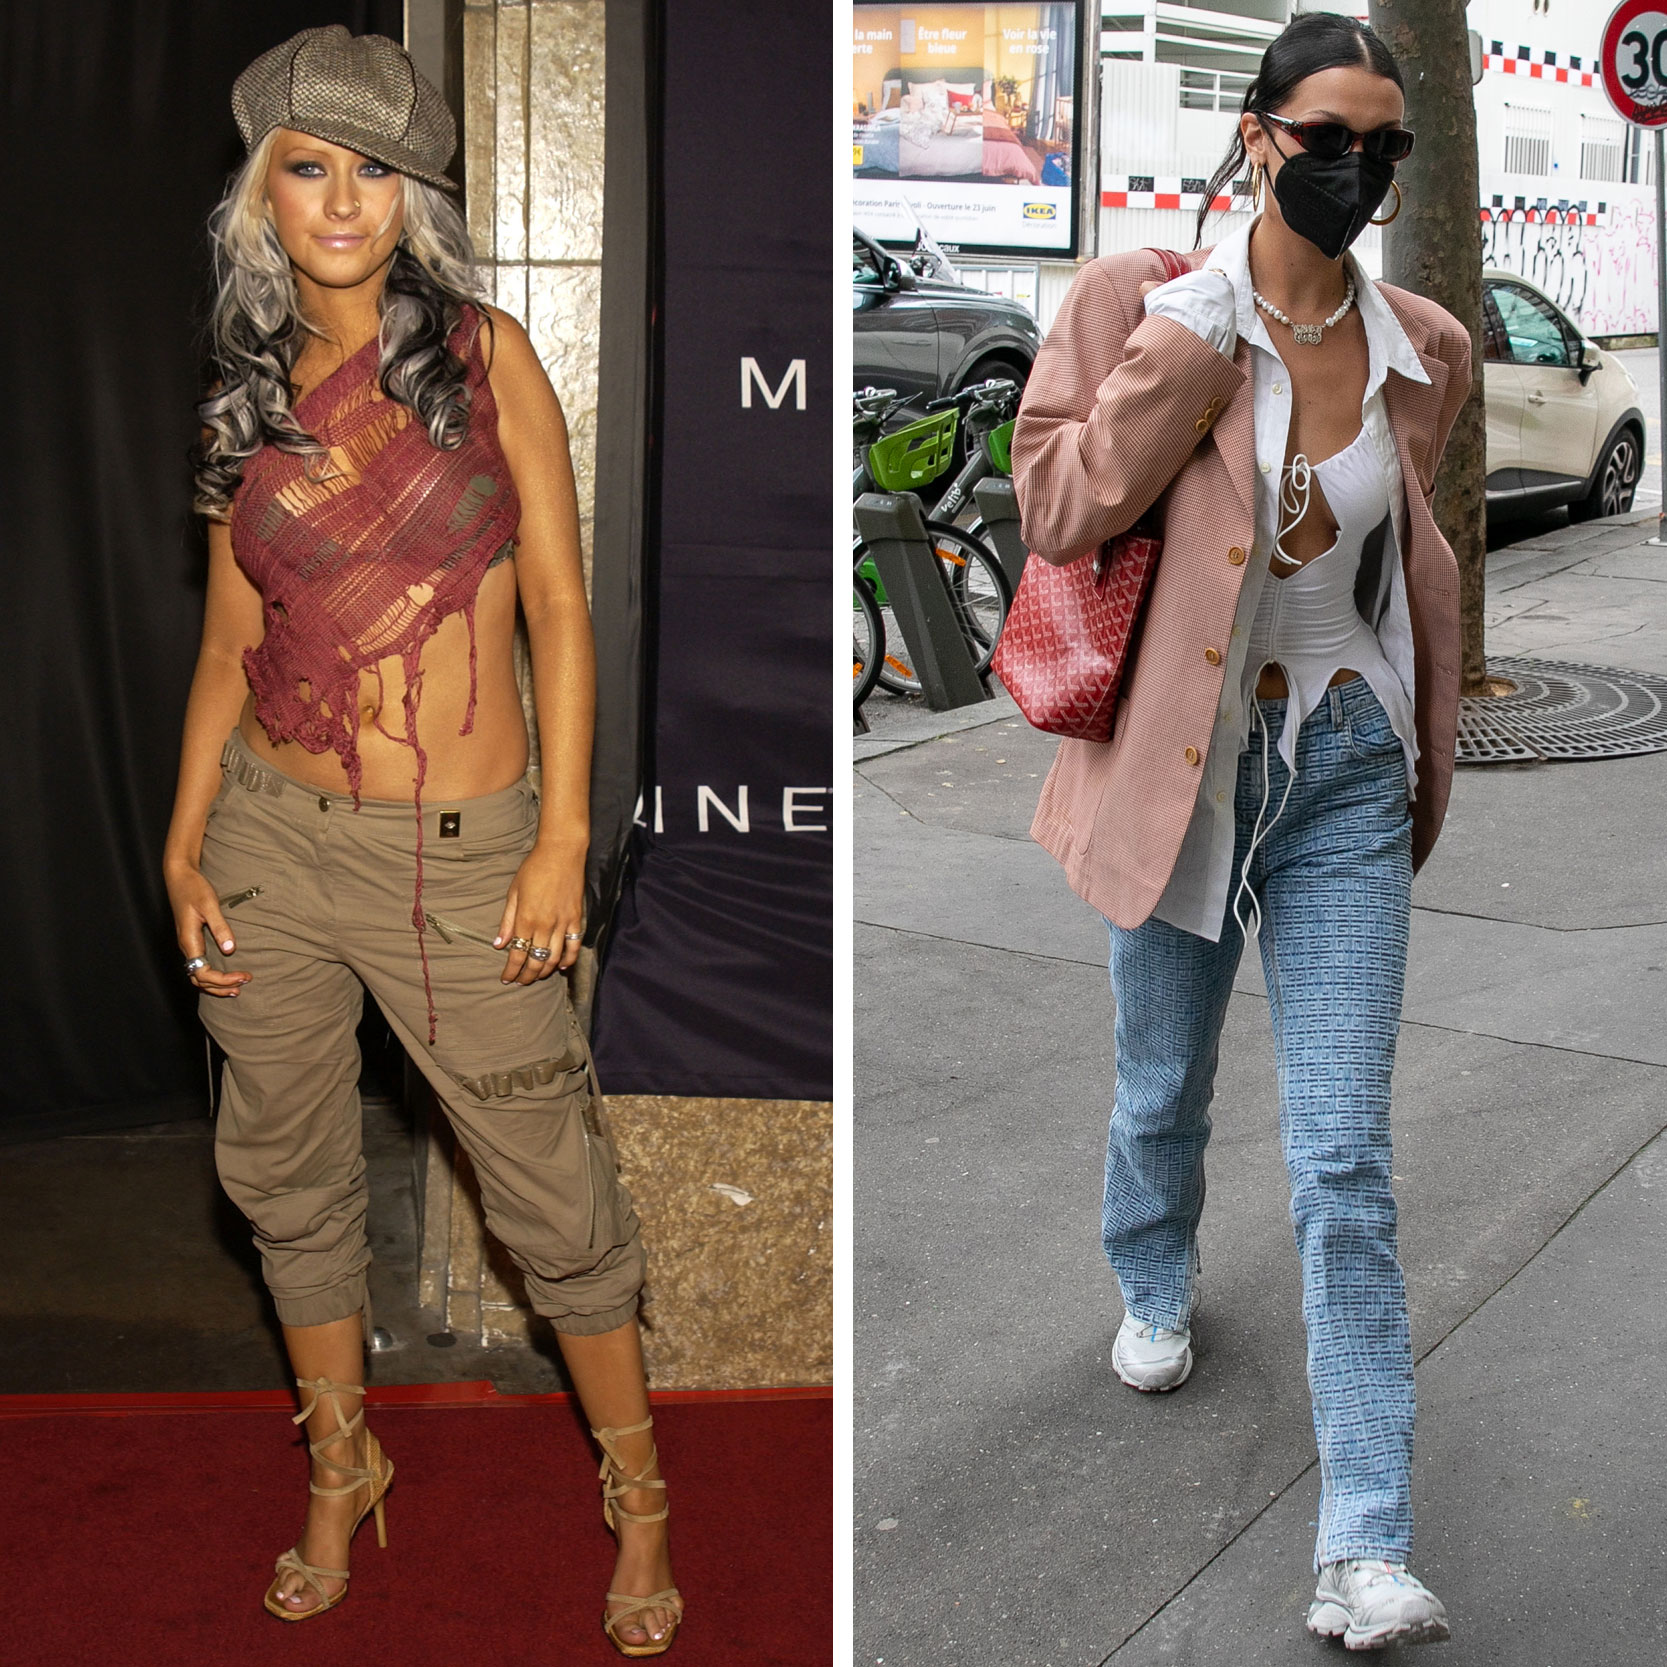 Everyone Is Dressing Like 2002 Christina Aguilera Now